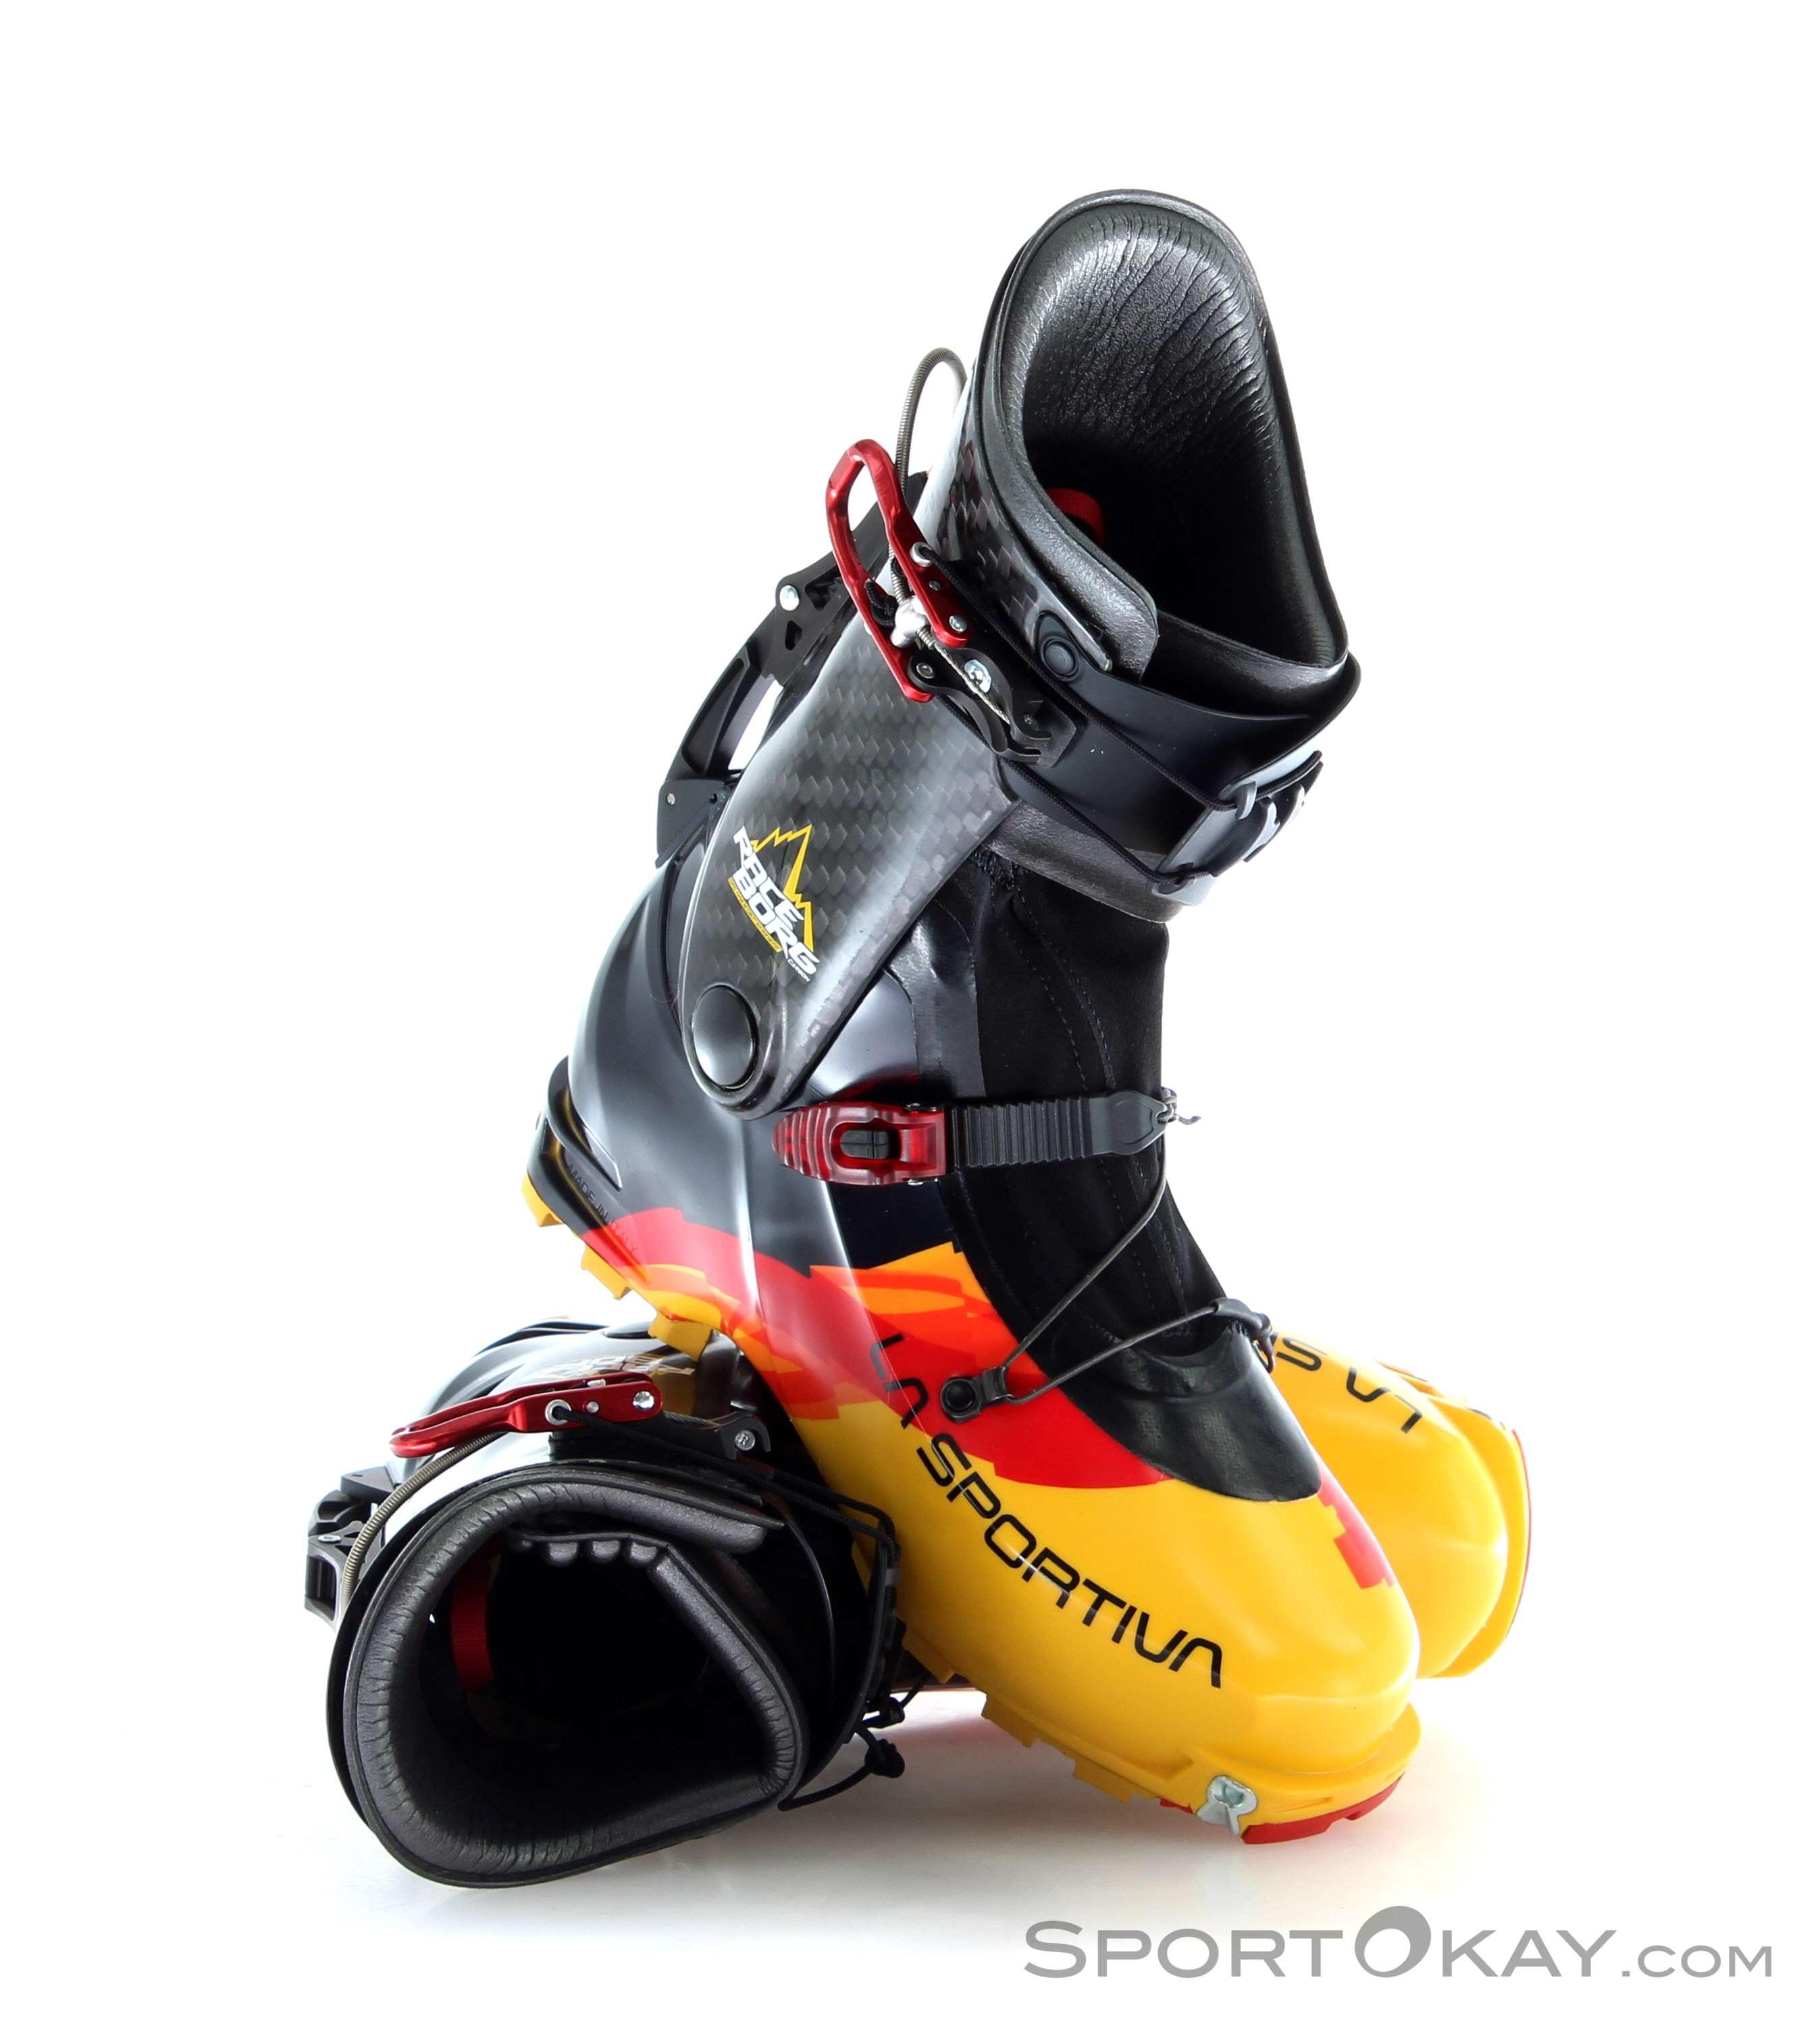 La Sportiva Raceborg Ski Touring Boots